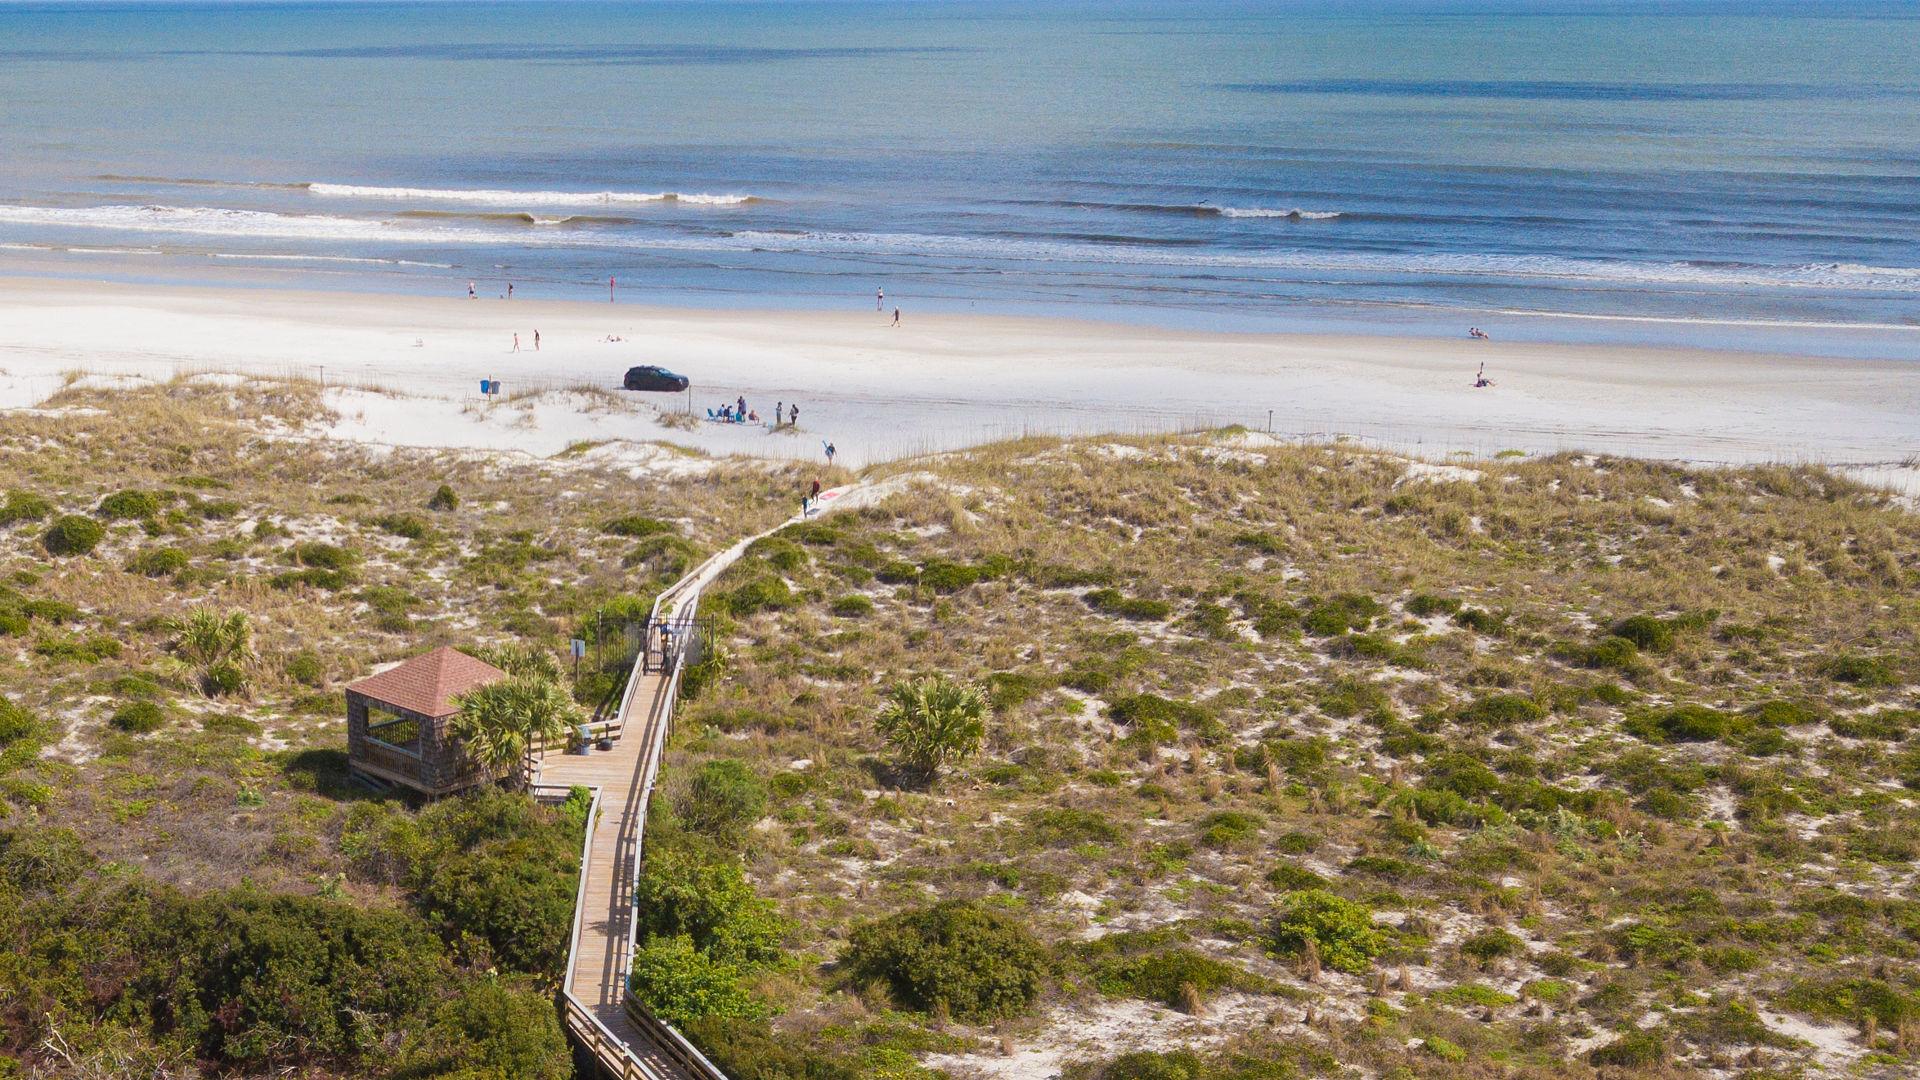 Gazebo boardwalk to beach